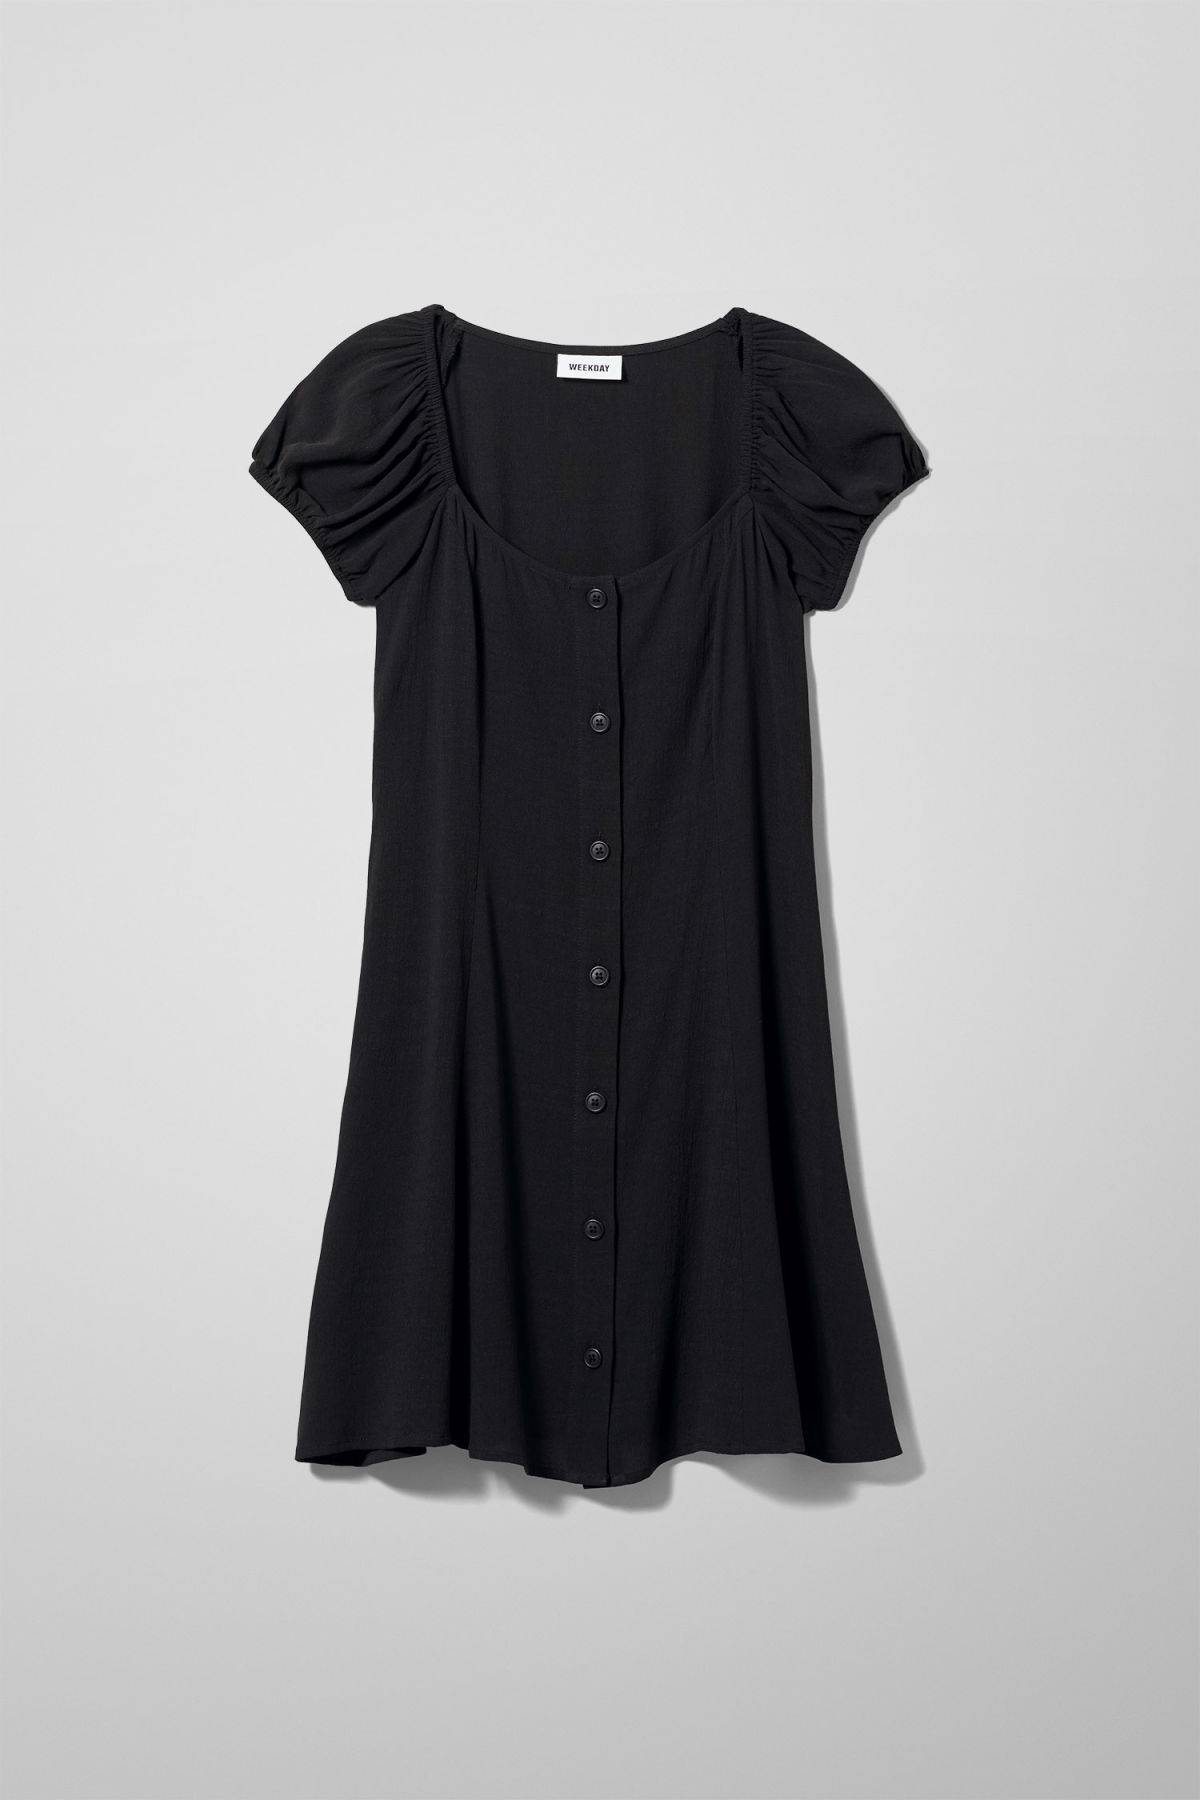 Image of Mina Dress - Black-38